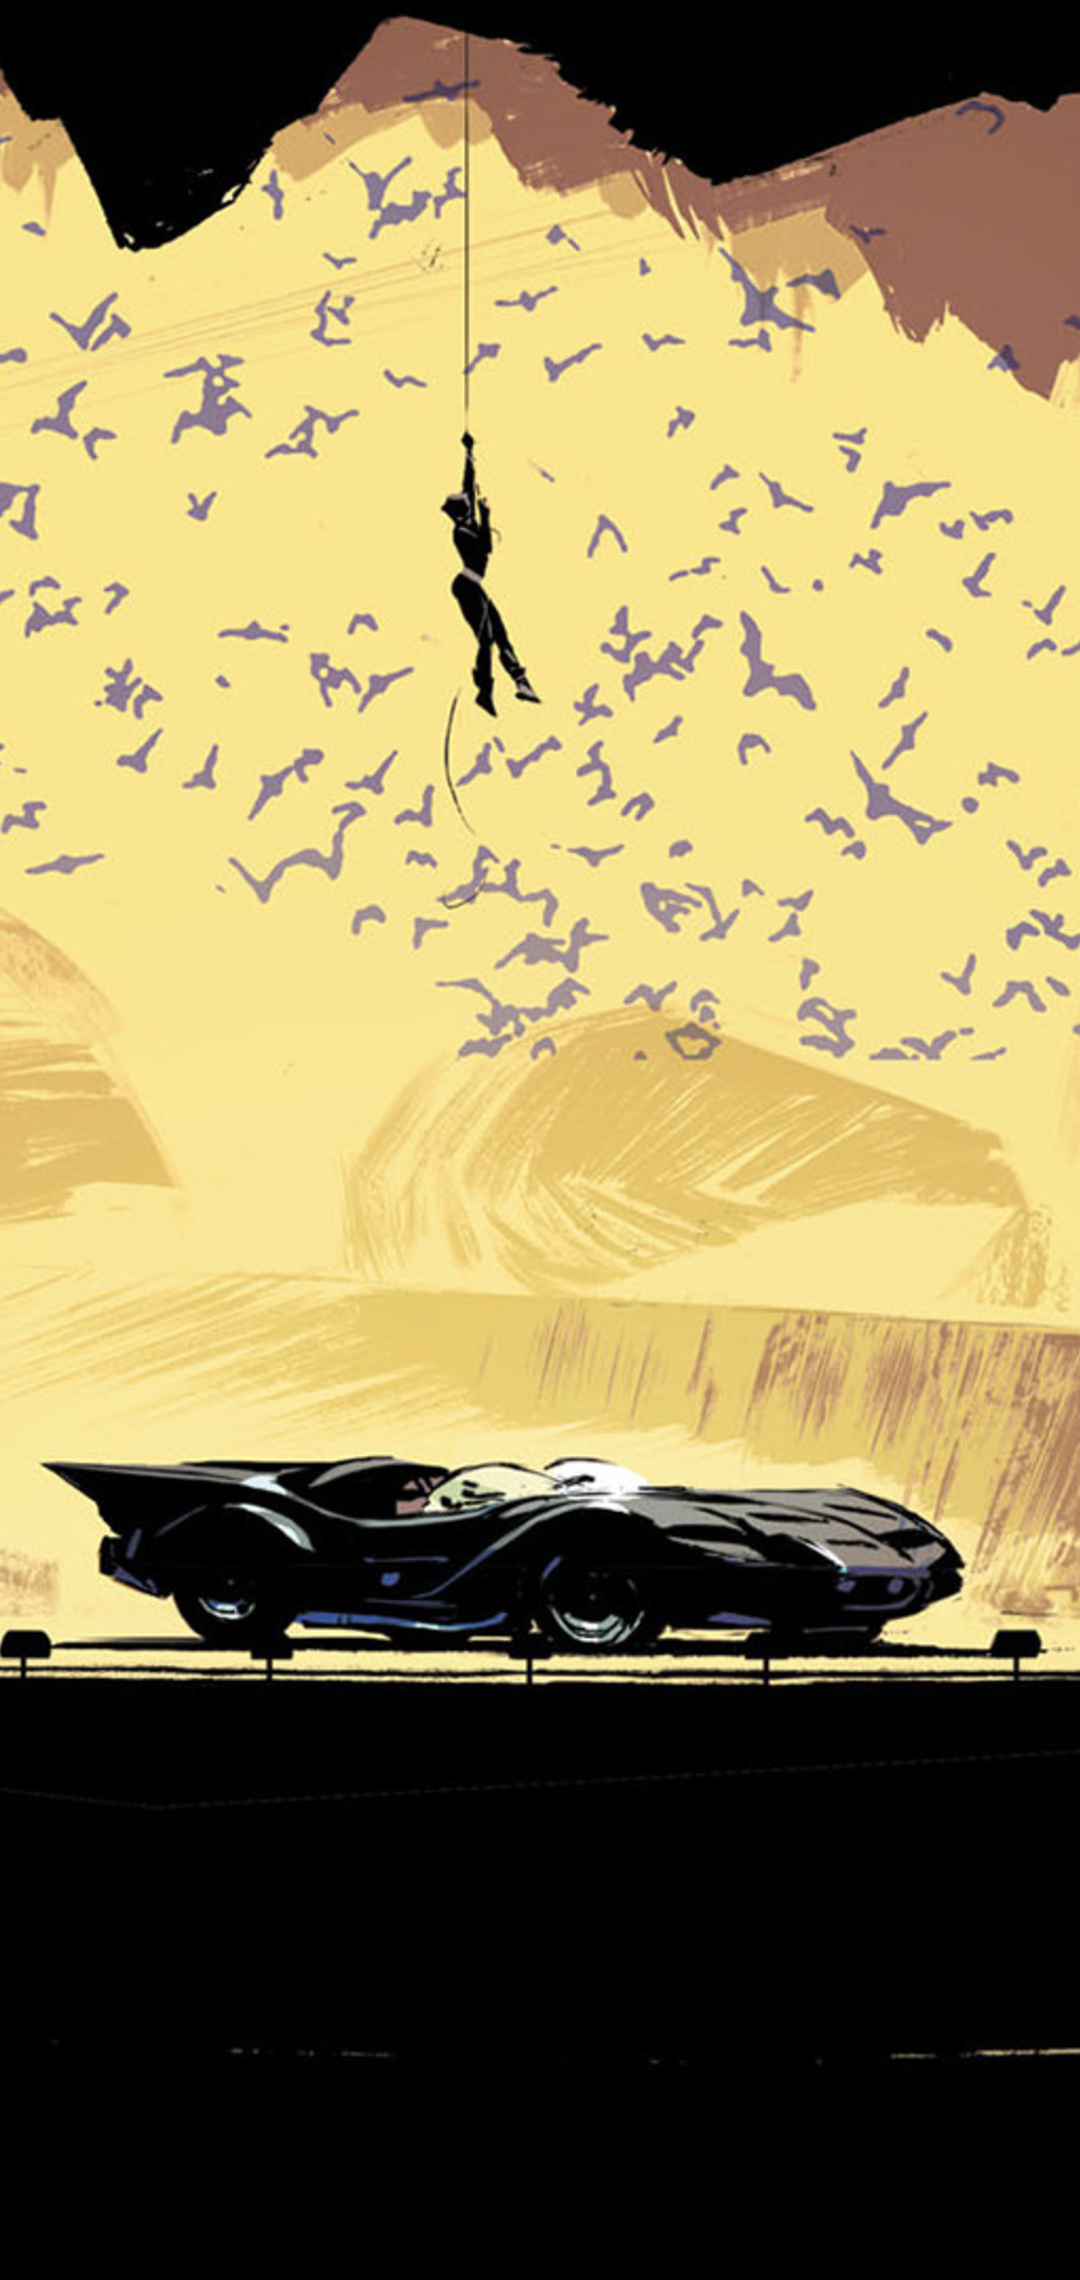 batcave-catwoman-dc-comics-artwork-iw.jpg